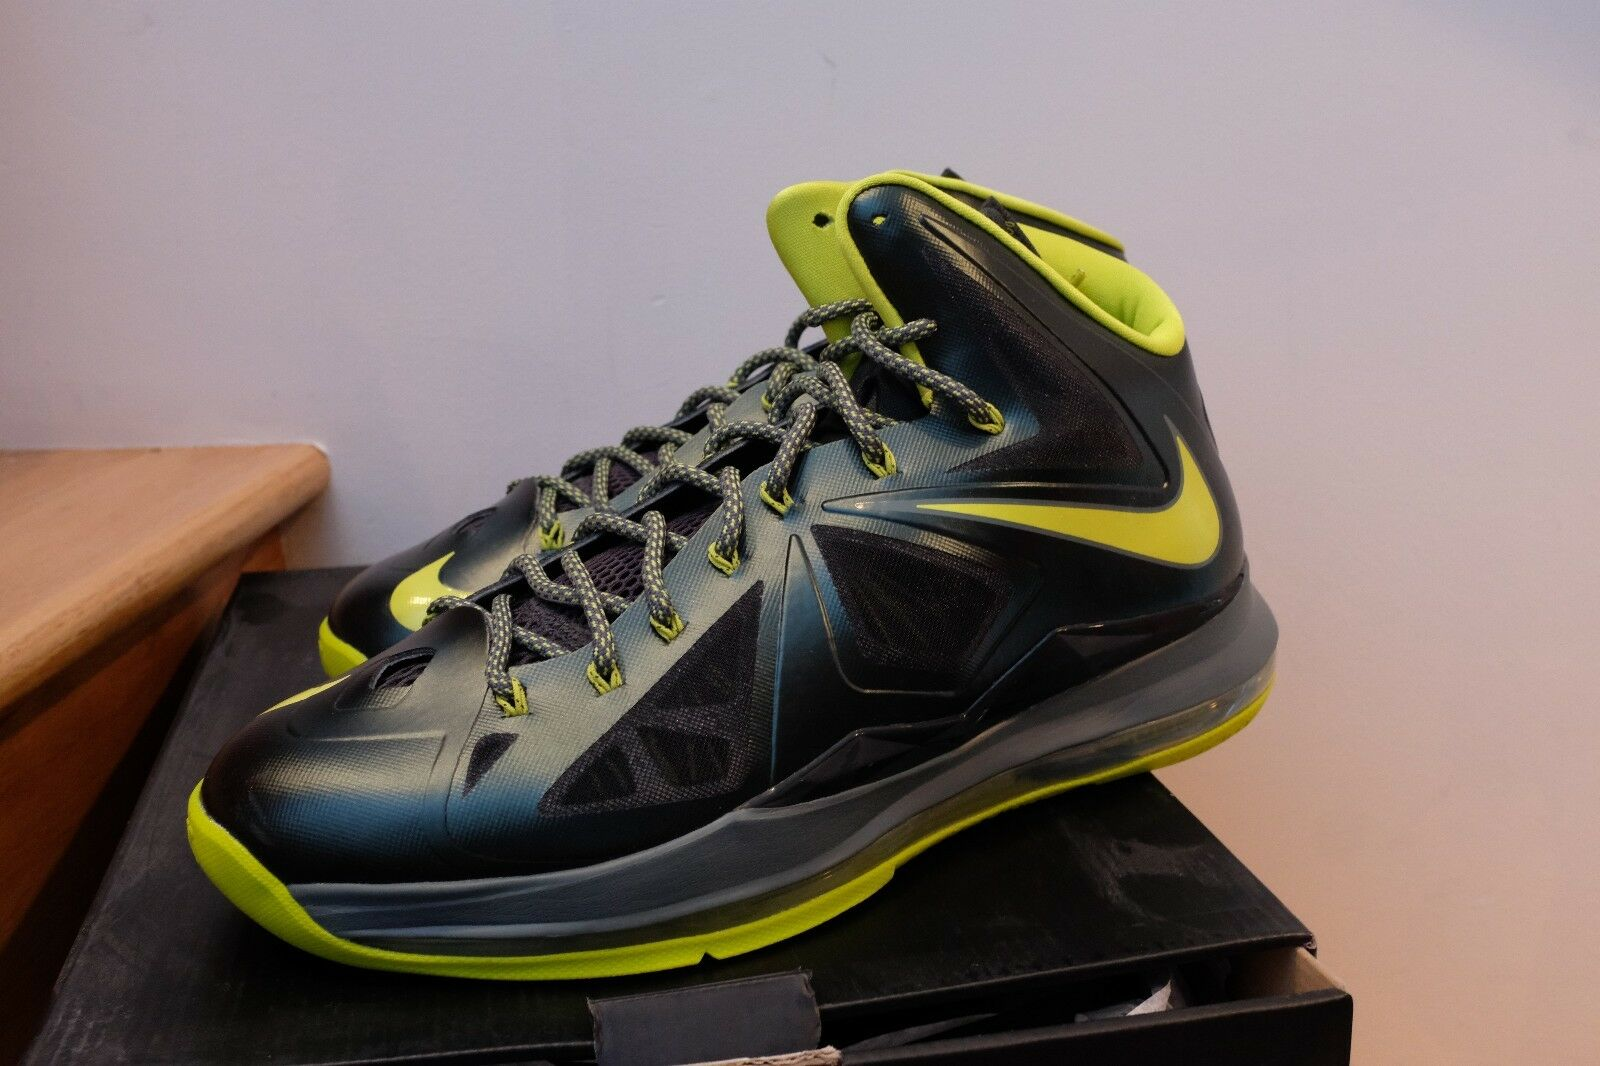 Nike Lebron X 10 Dunkman Atomic Green Seaweed Air Max size 13